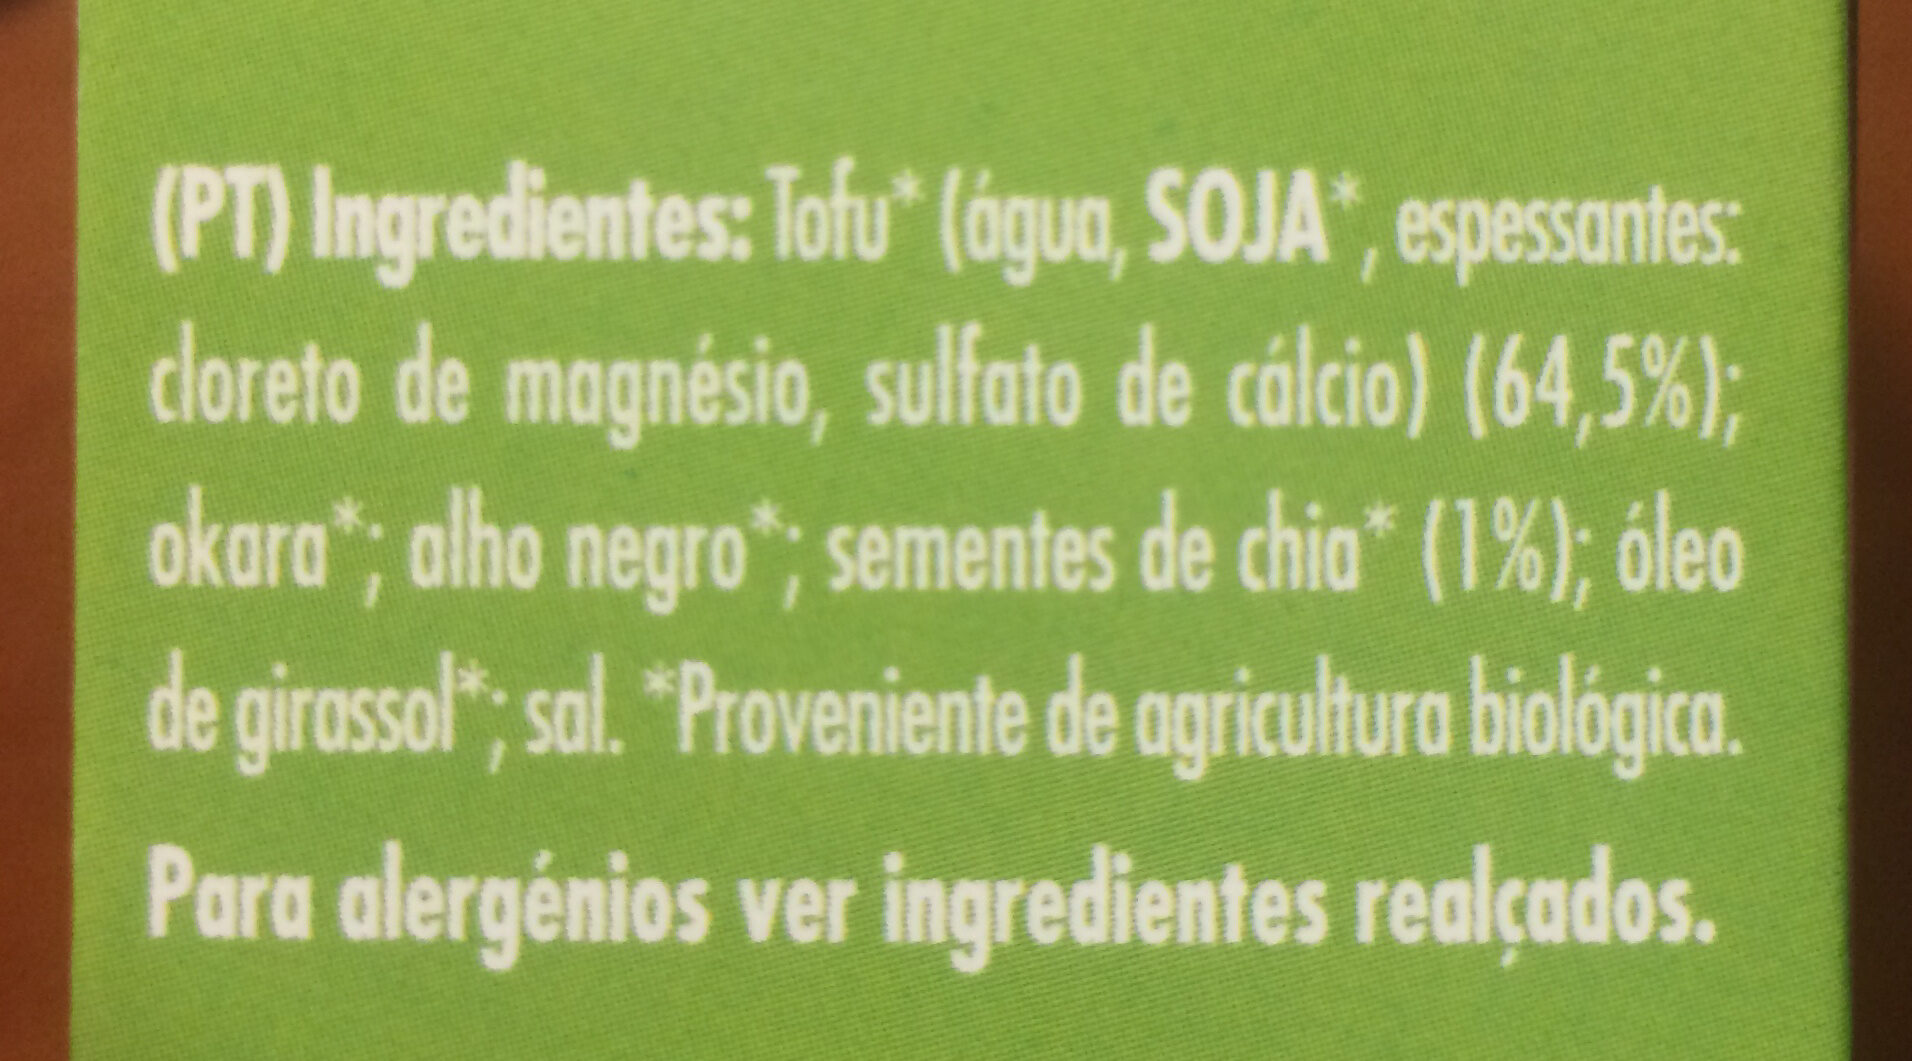 Cem Porcento Hambúrguer Proteico Tofu e Chia - Ingredients - pt